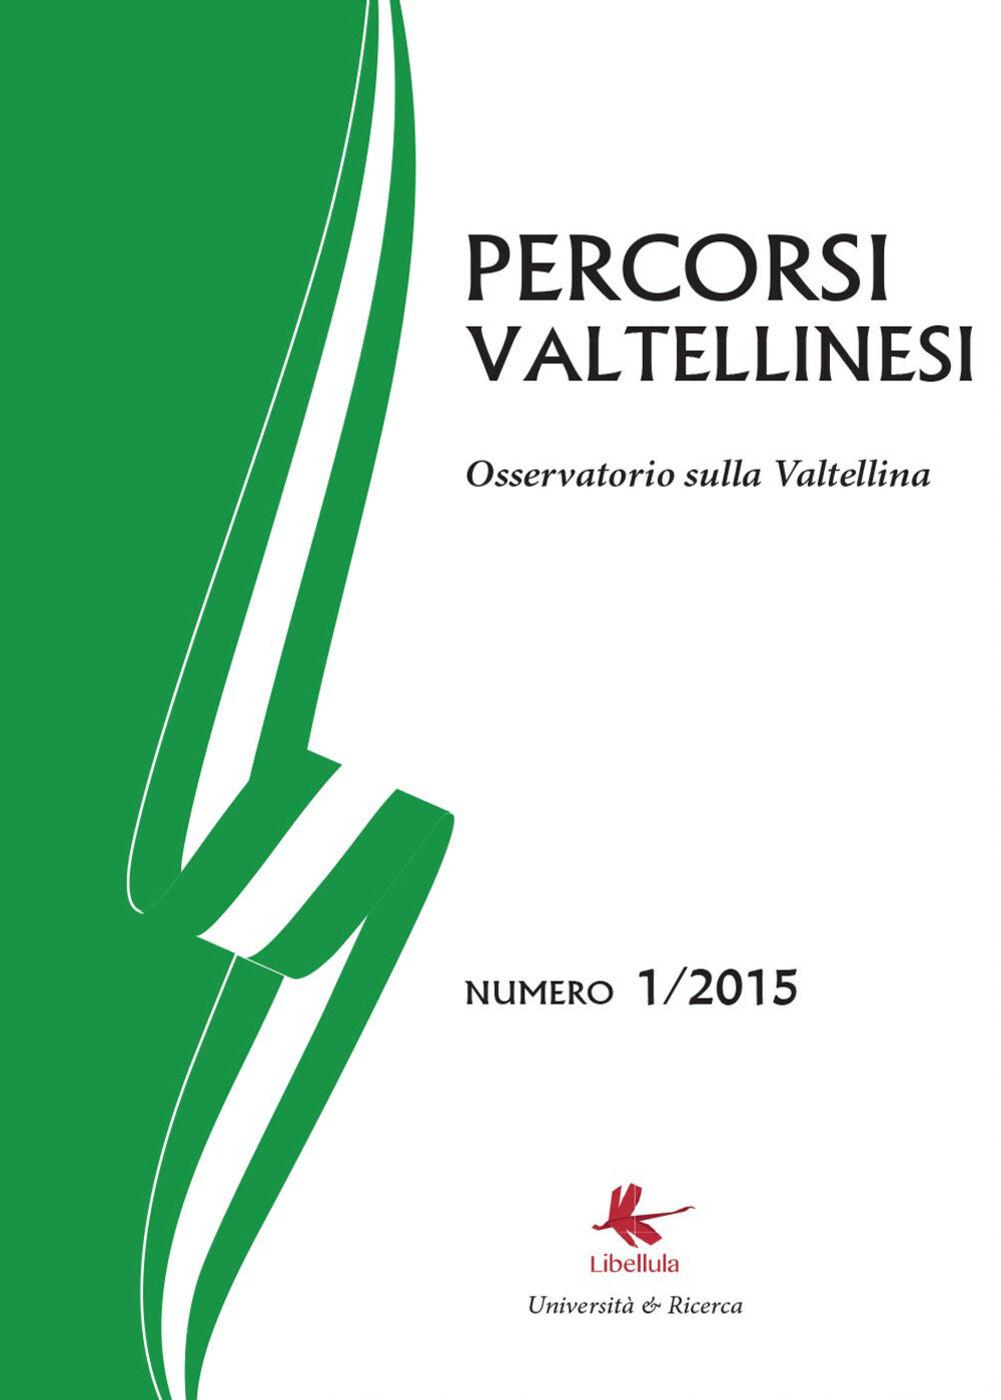 Percorsi valtellinesi. Osservatorio sulla Valtellina (2015). Vol. 1